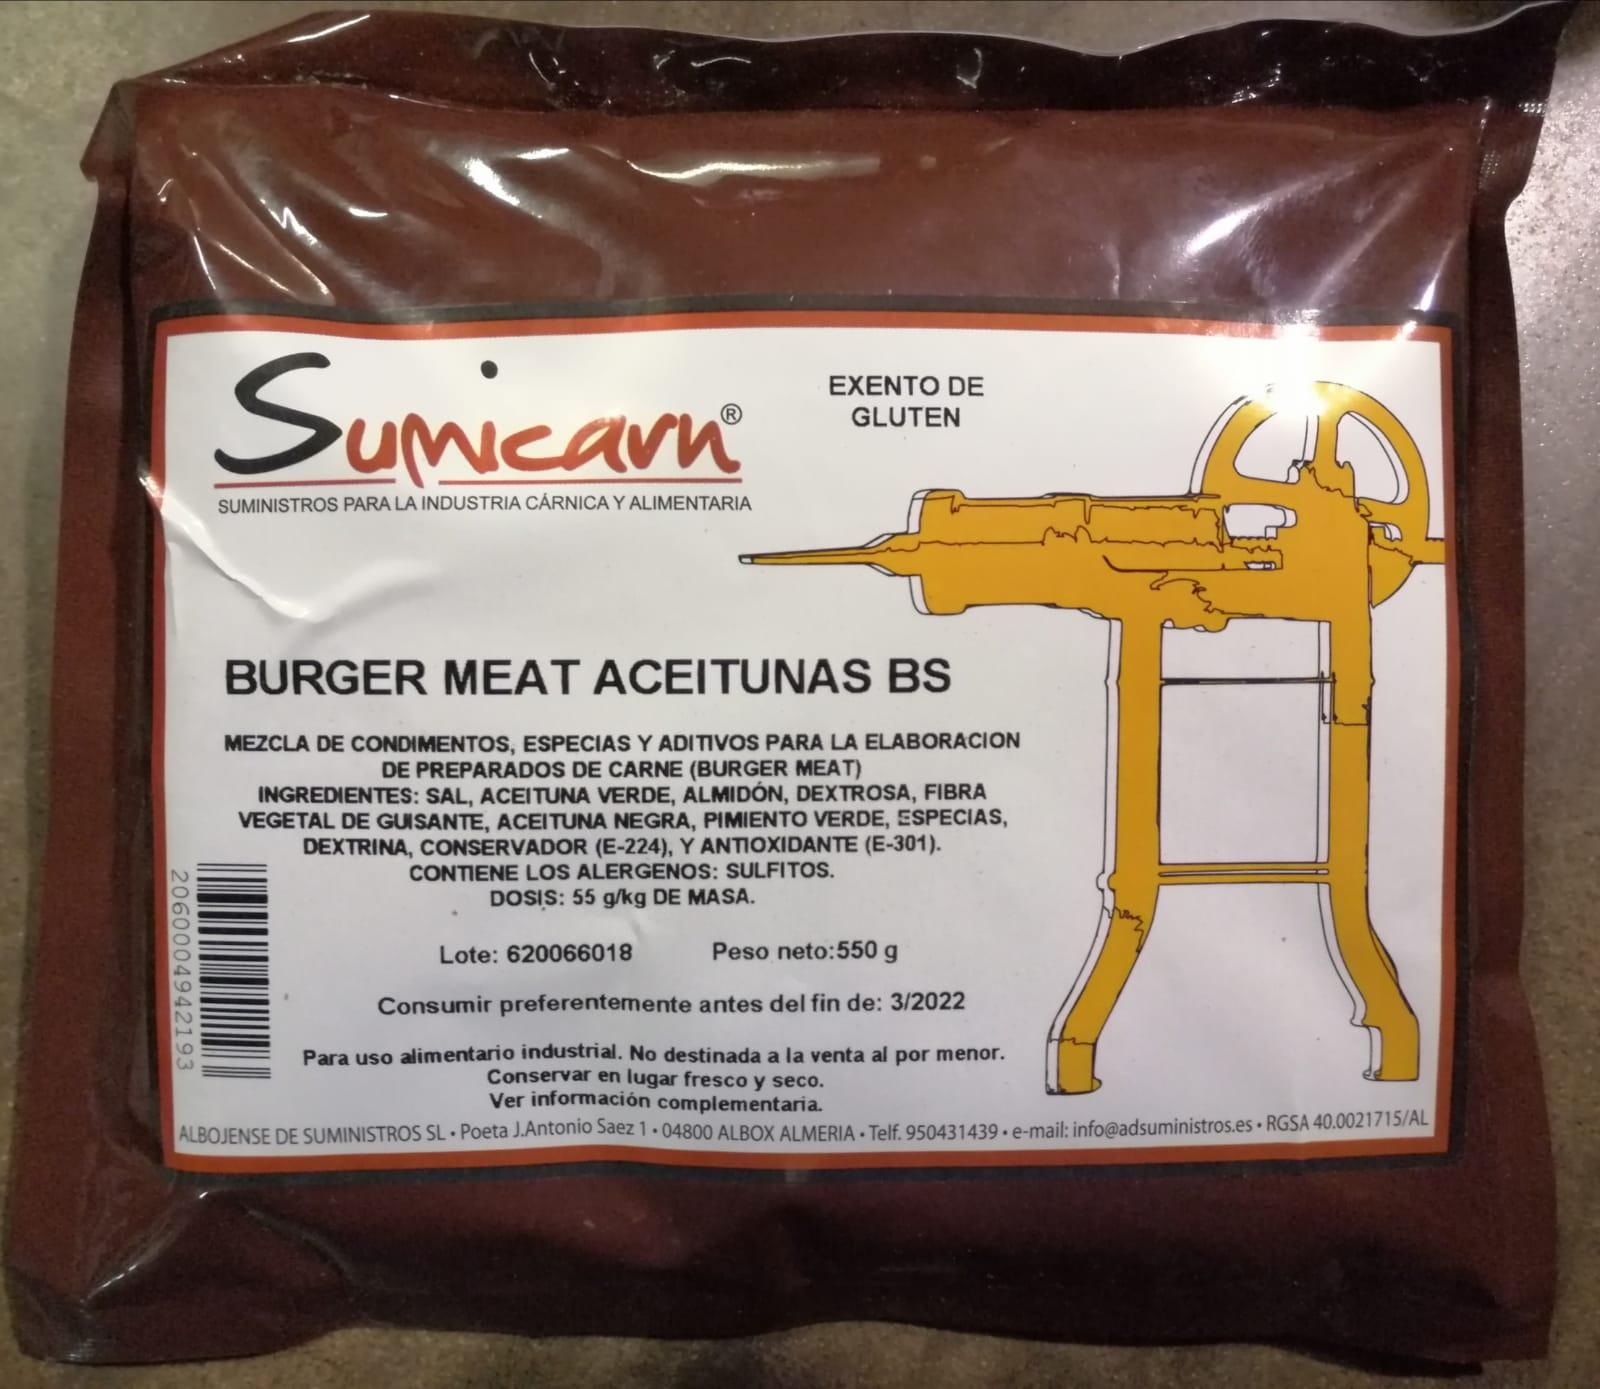 Burger meat exclusivos sumicarn Img-2102